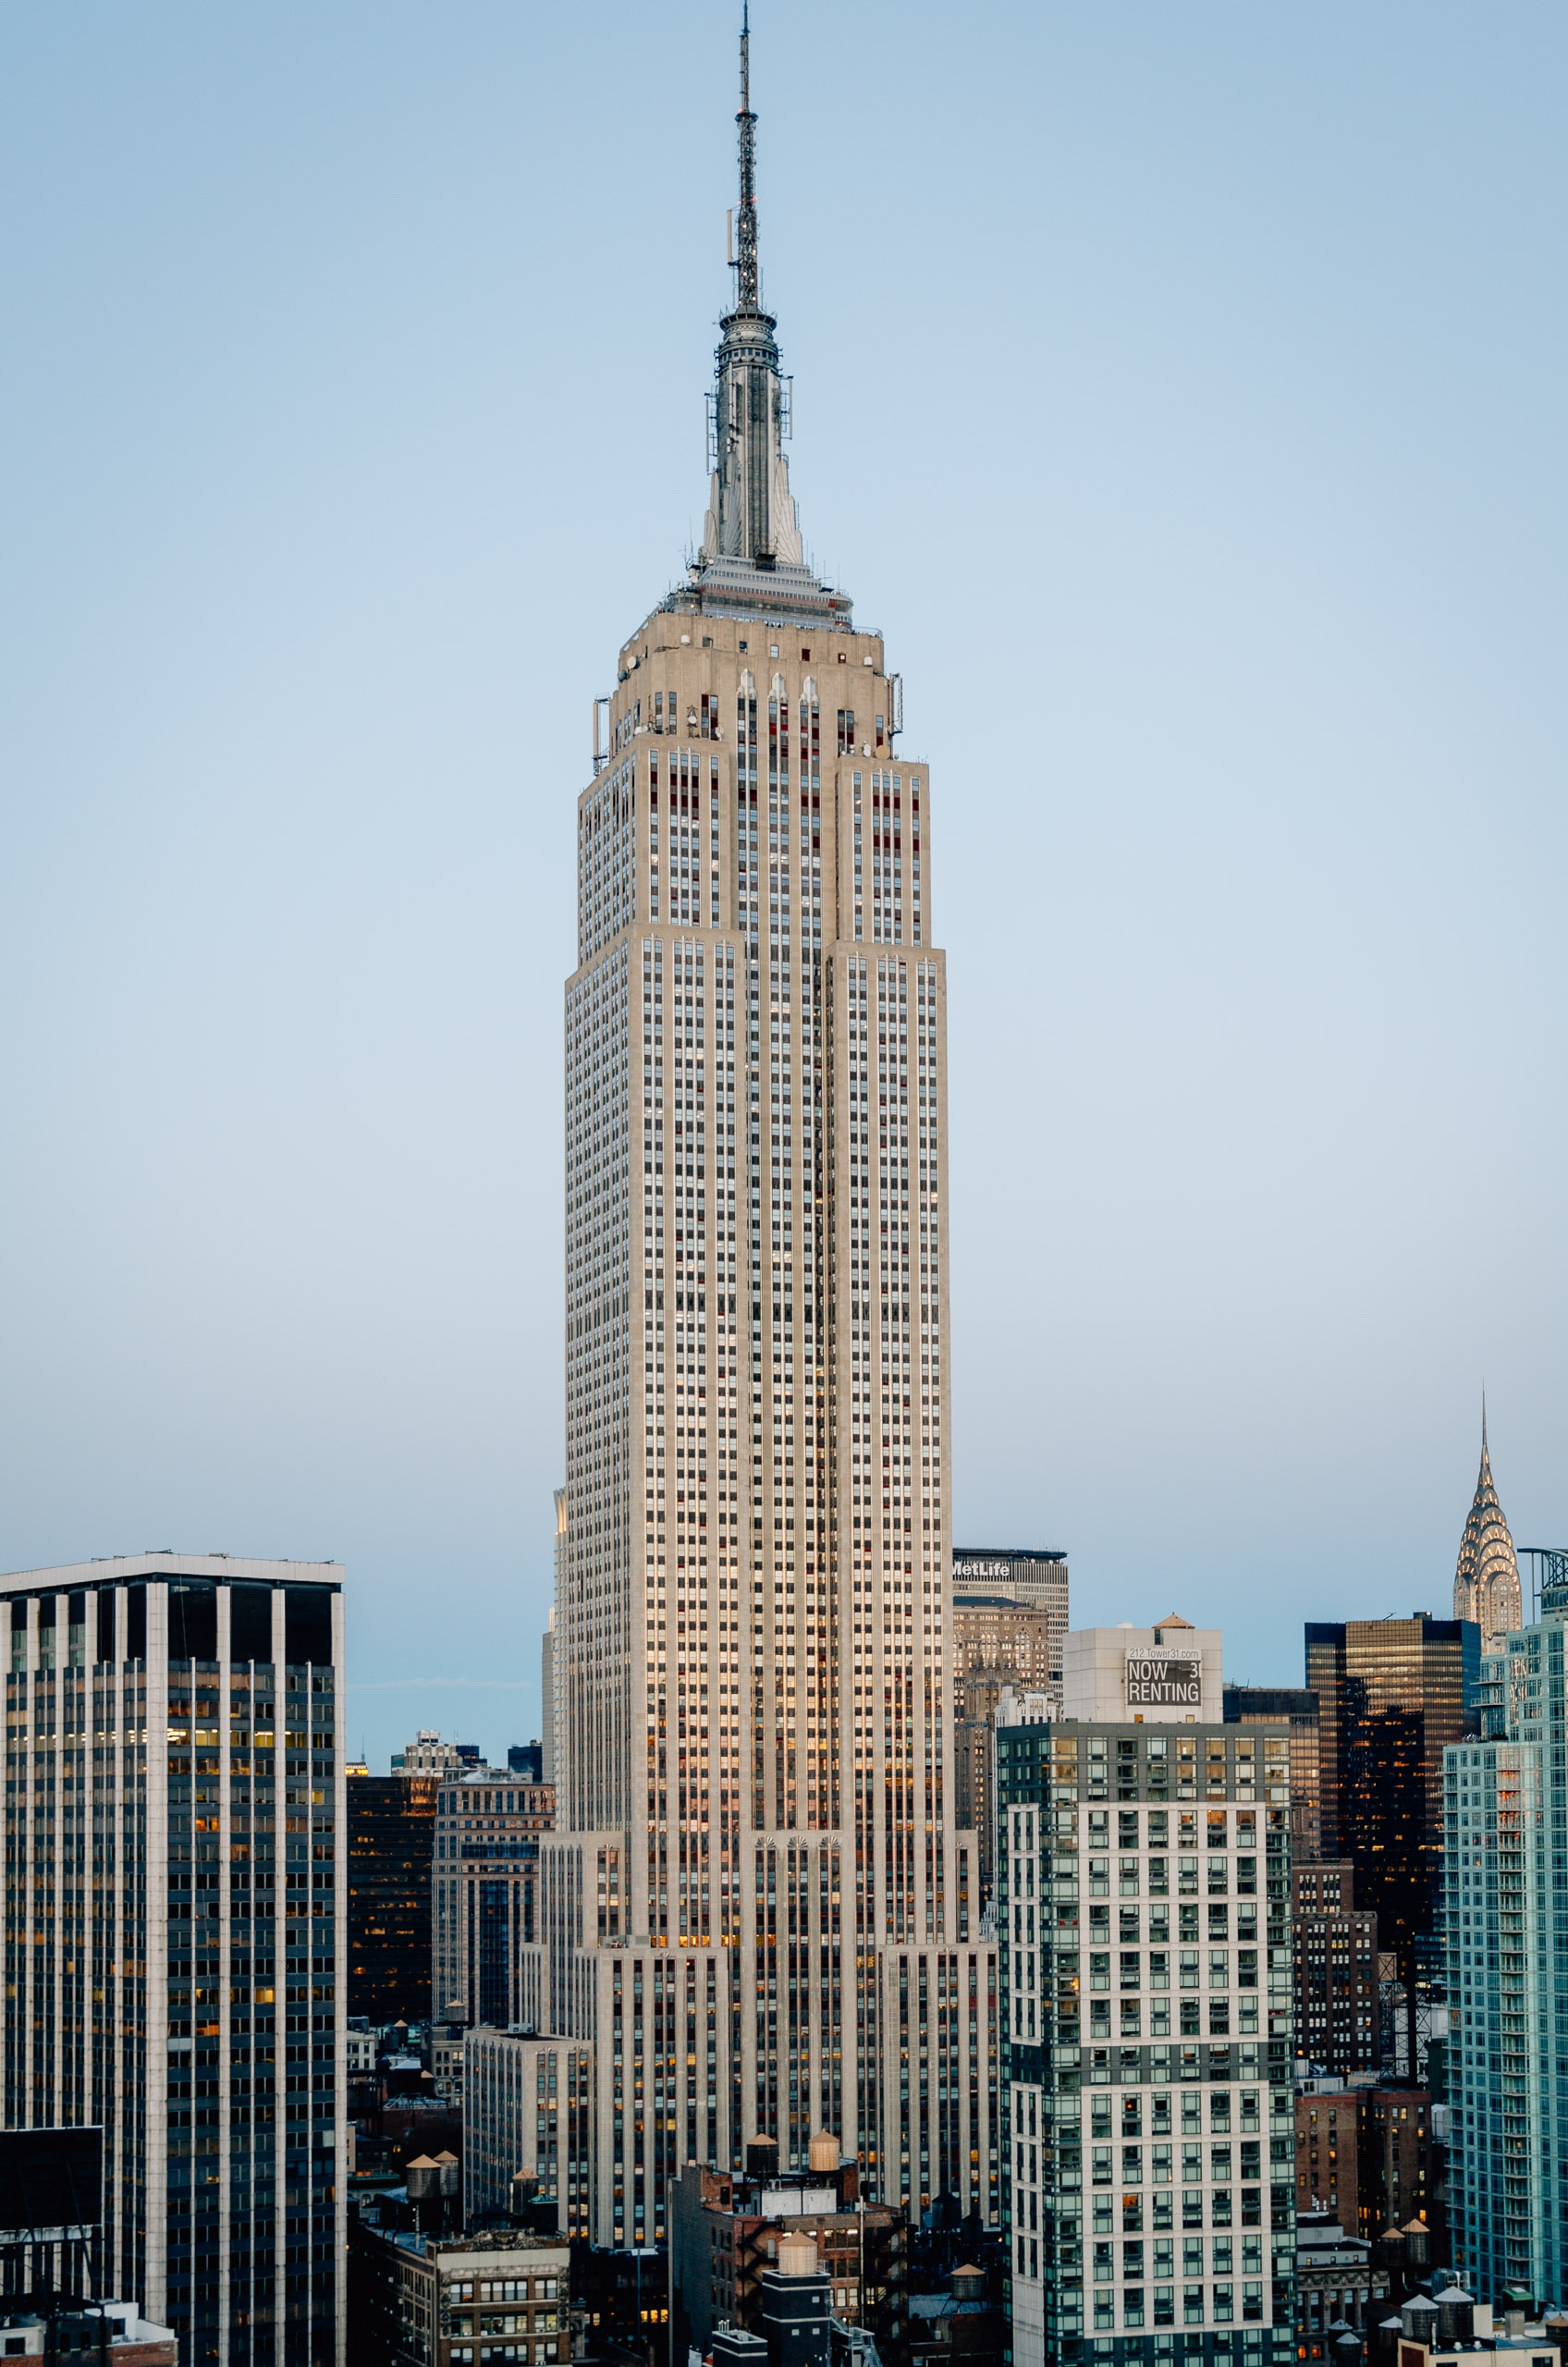 New York City - 2010-1220-DSC_0055_84958